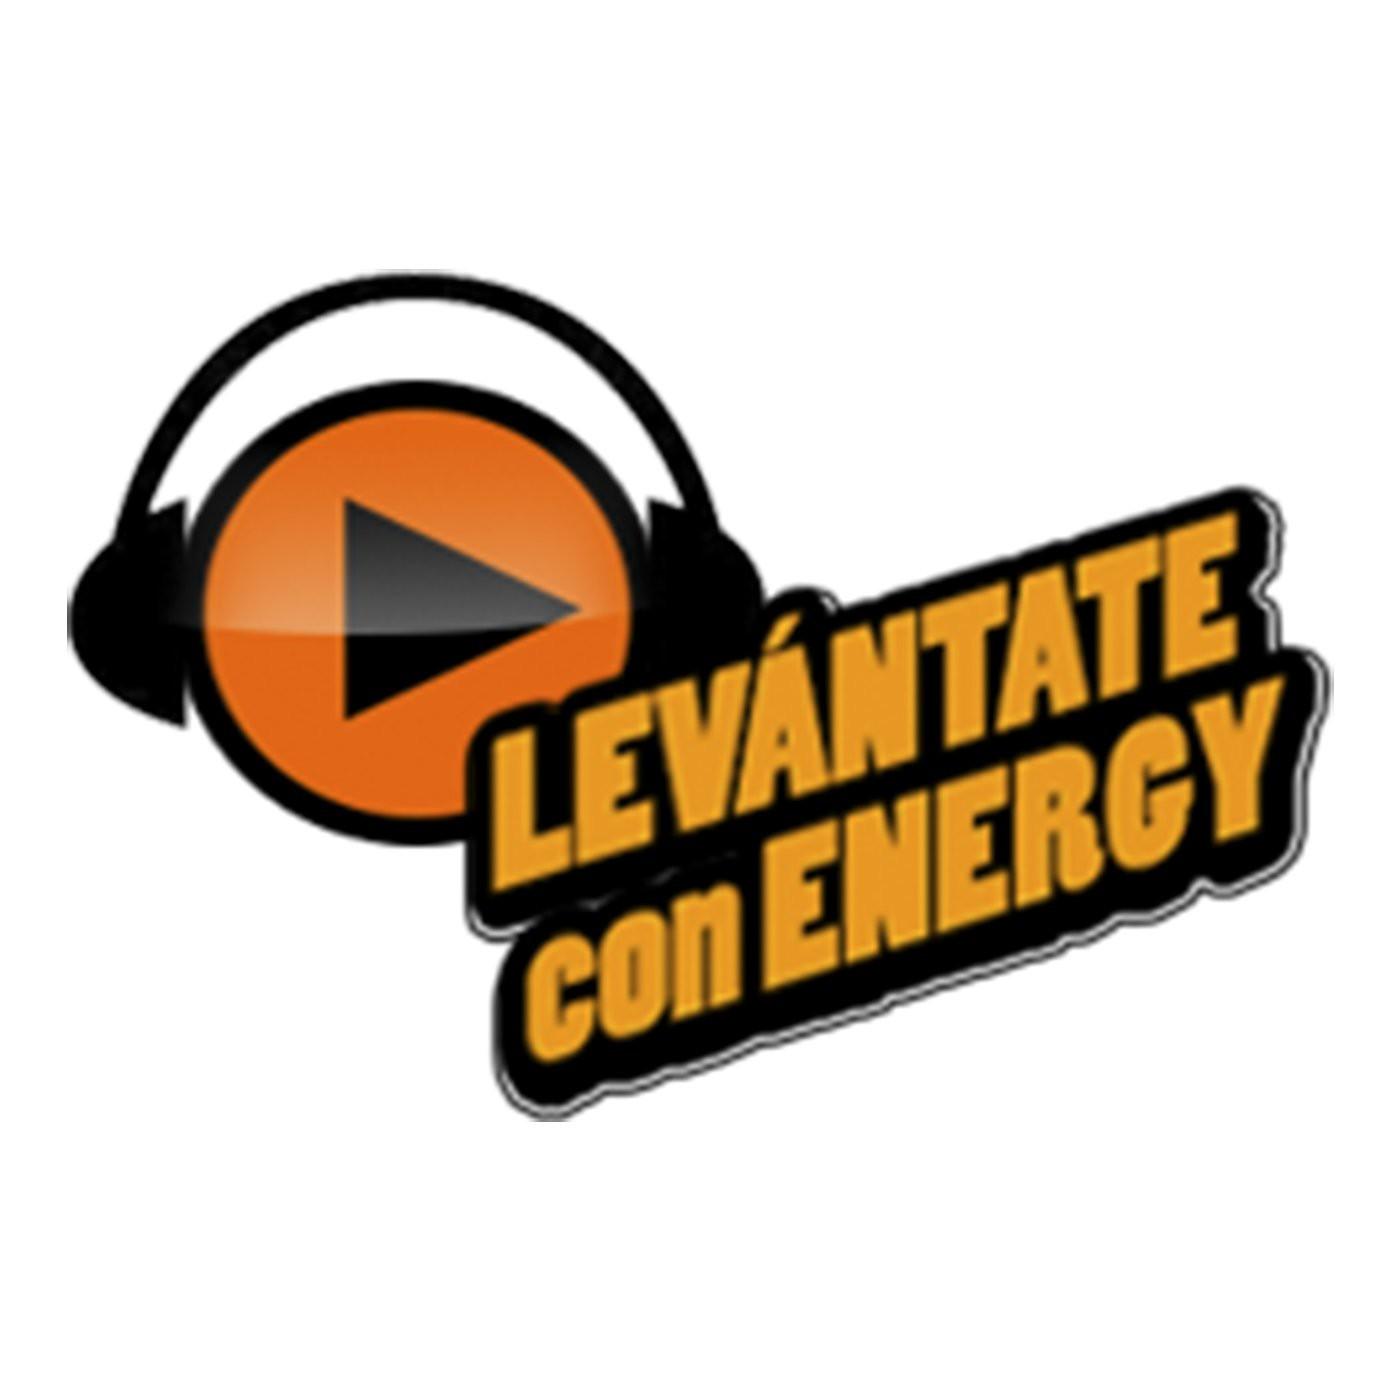 <![CDATA[Levantate Con Energy]]>